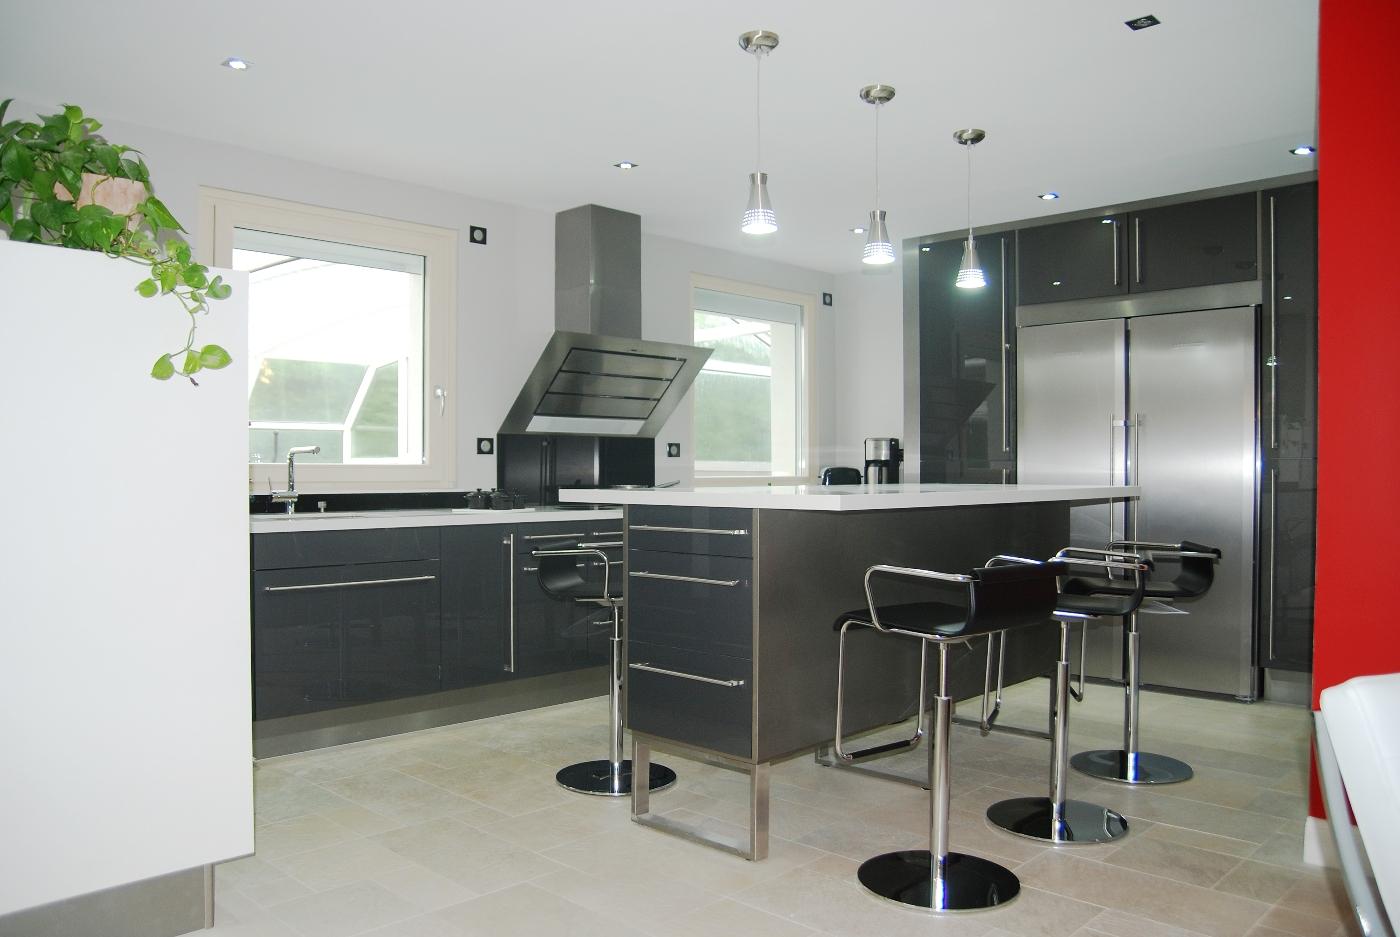 ilot cuisine repas ilot de cuisine avec coin repas cuisine leicht et with ilot cuisine repas. Black Bedroom Furniture Sets. Home Design Ideas